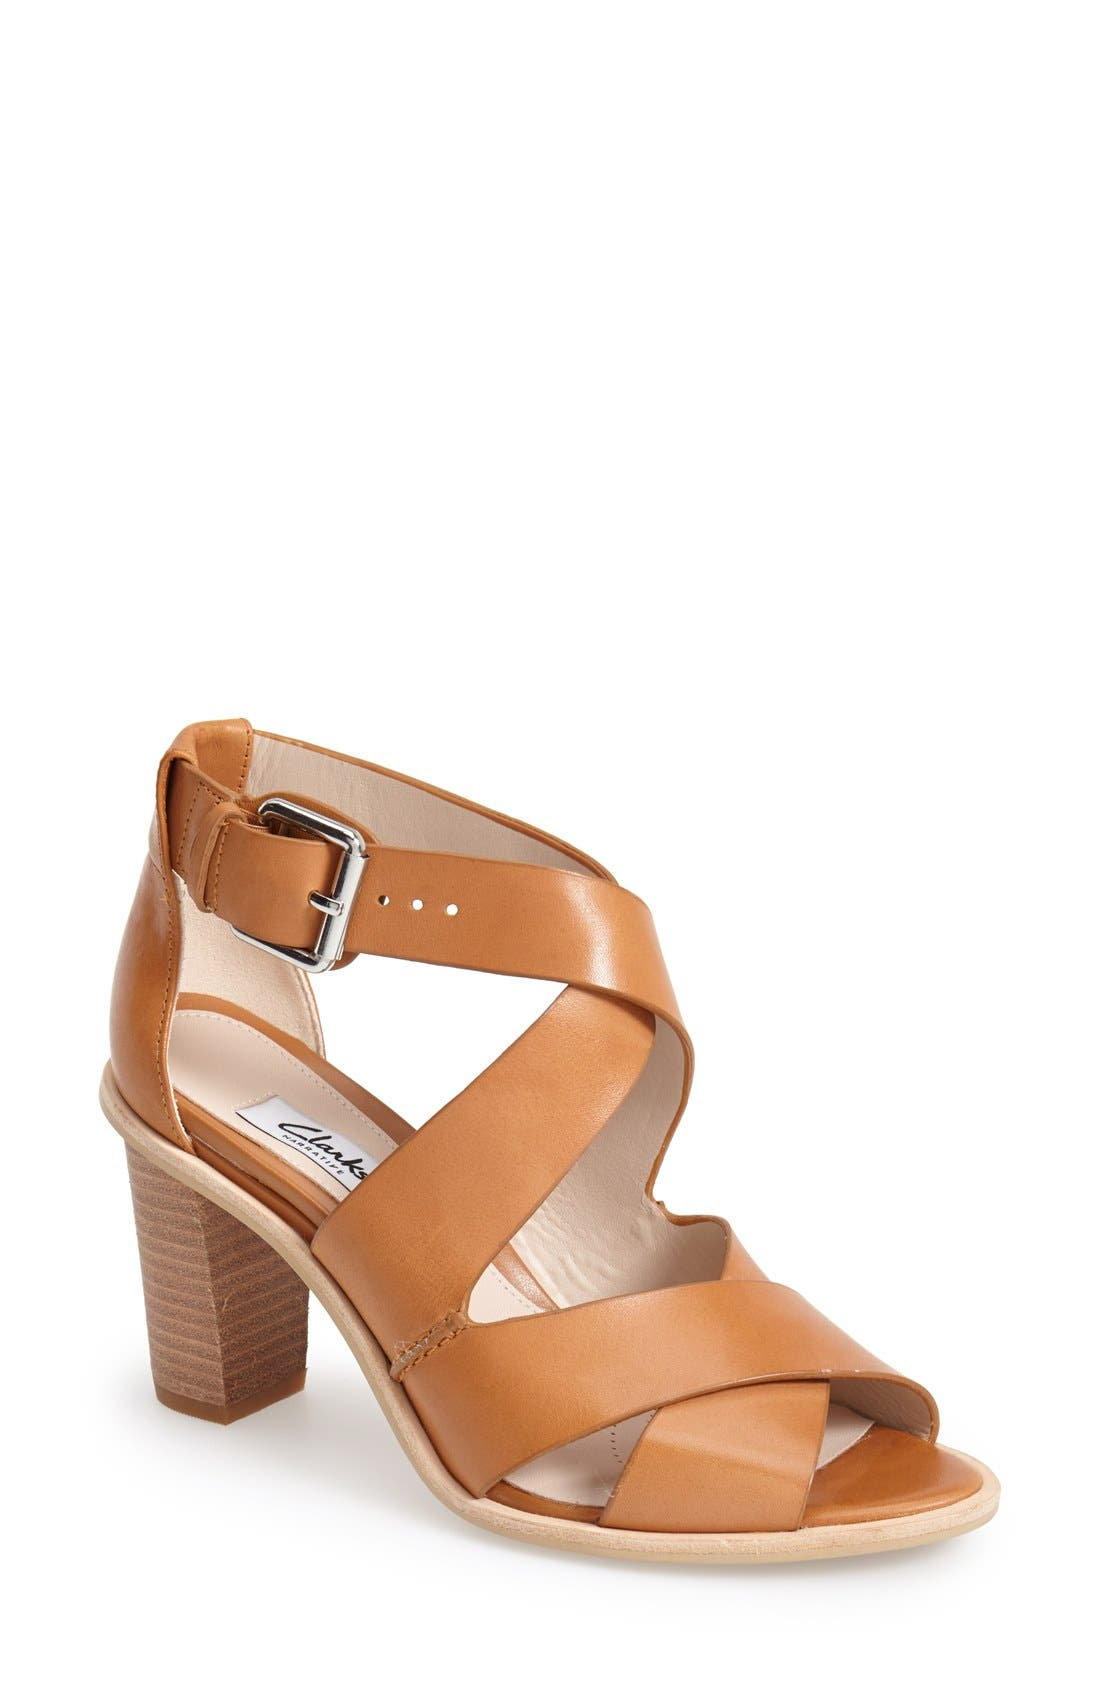 Alternate Image 1 Selected - Clarks® Narrative 'Oriana Bess' Sandal (Women)